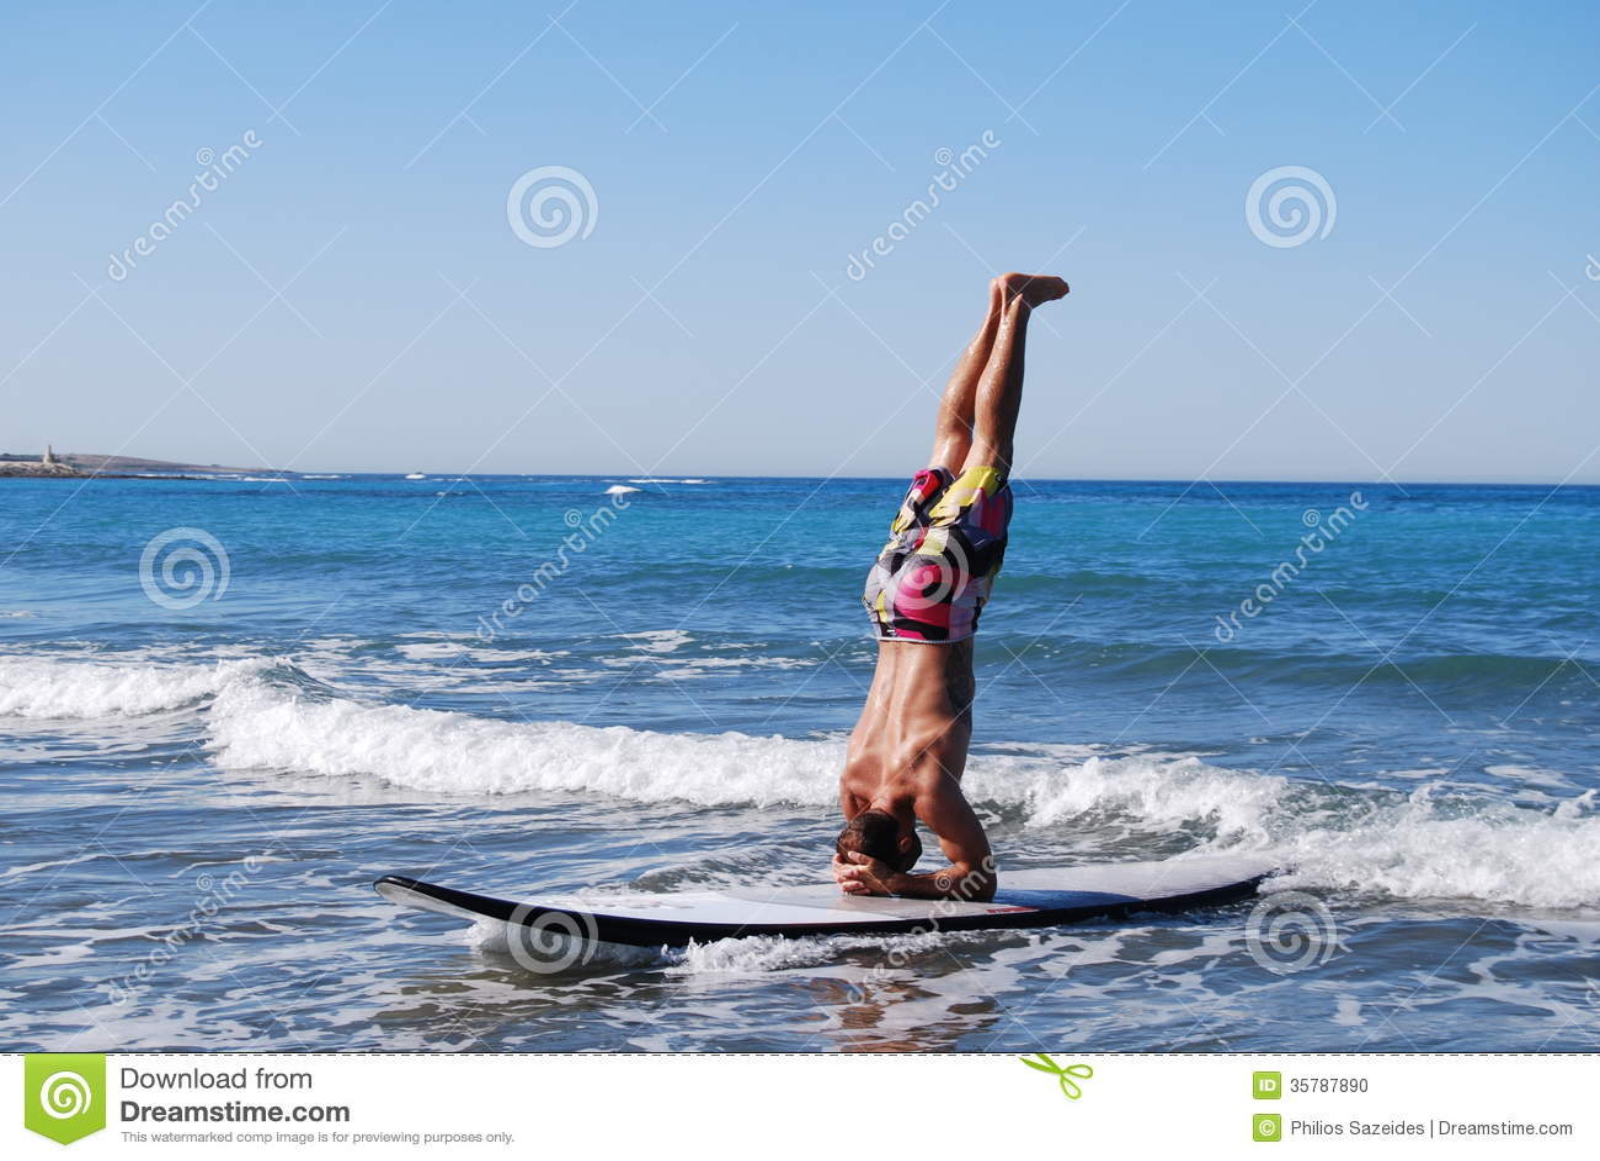 Blog - Driftwood Paddleboard Adventures